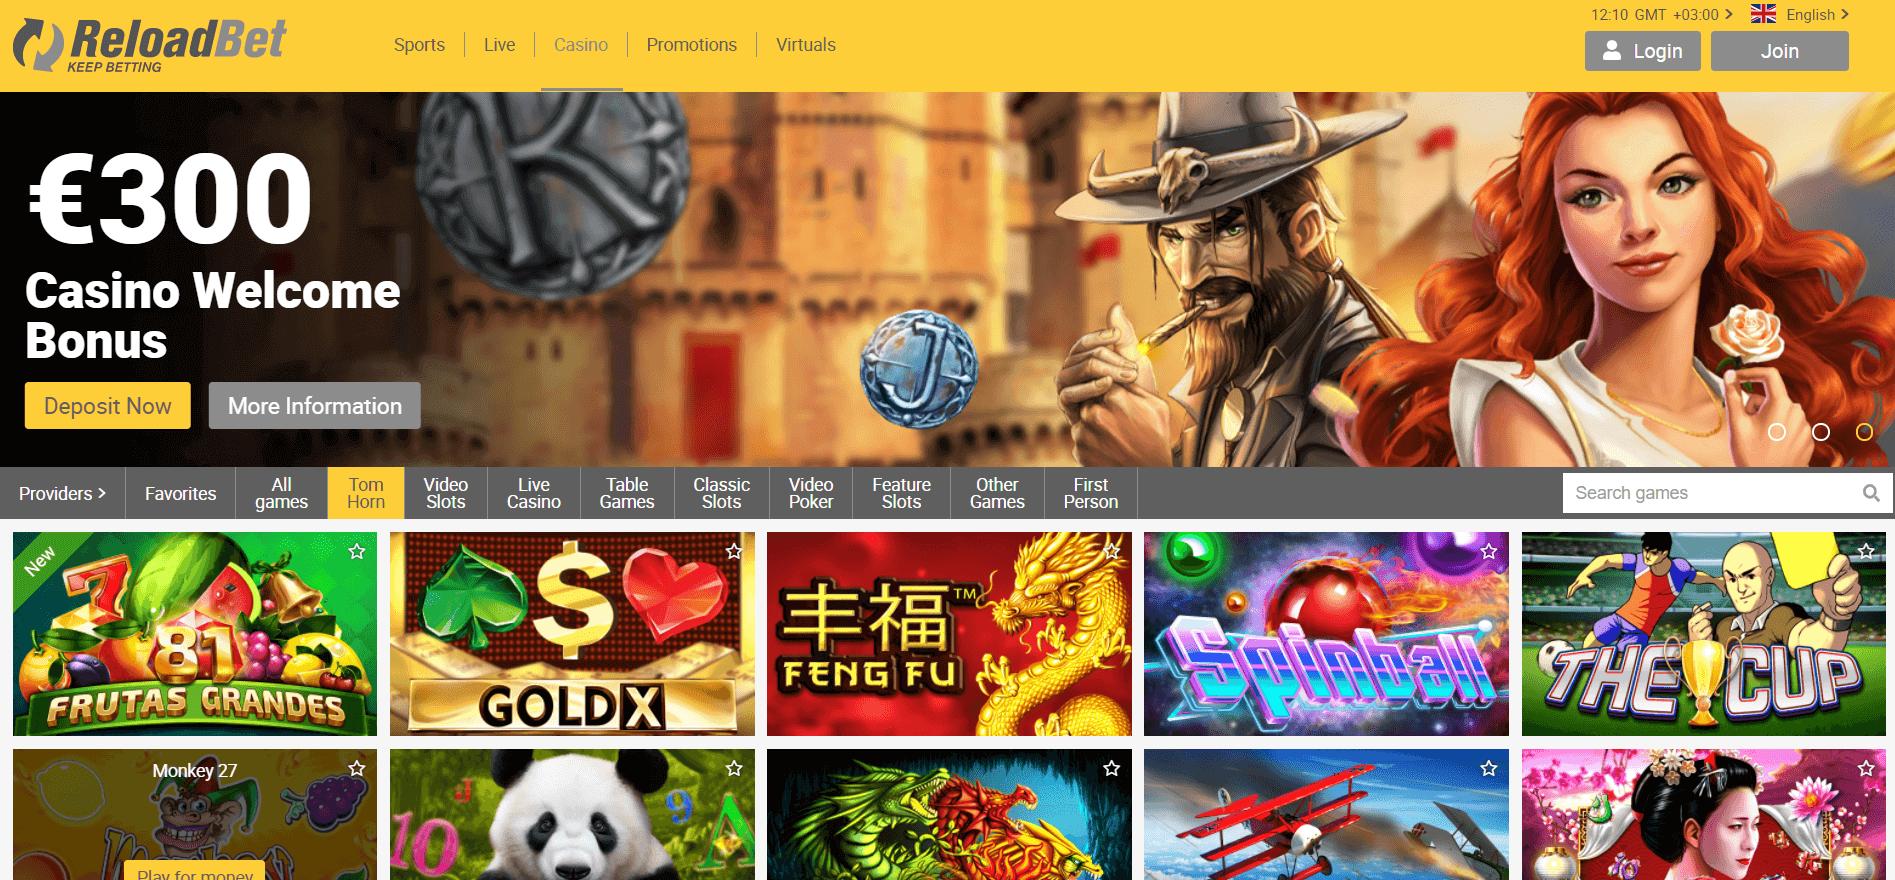 reloadbet casino-komarbet.com